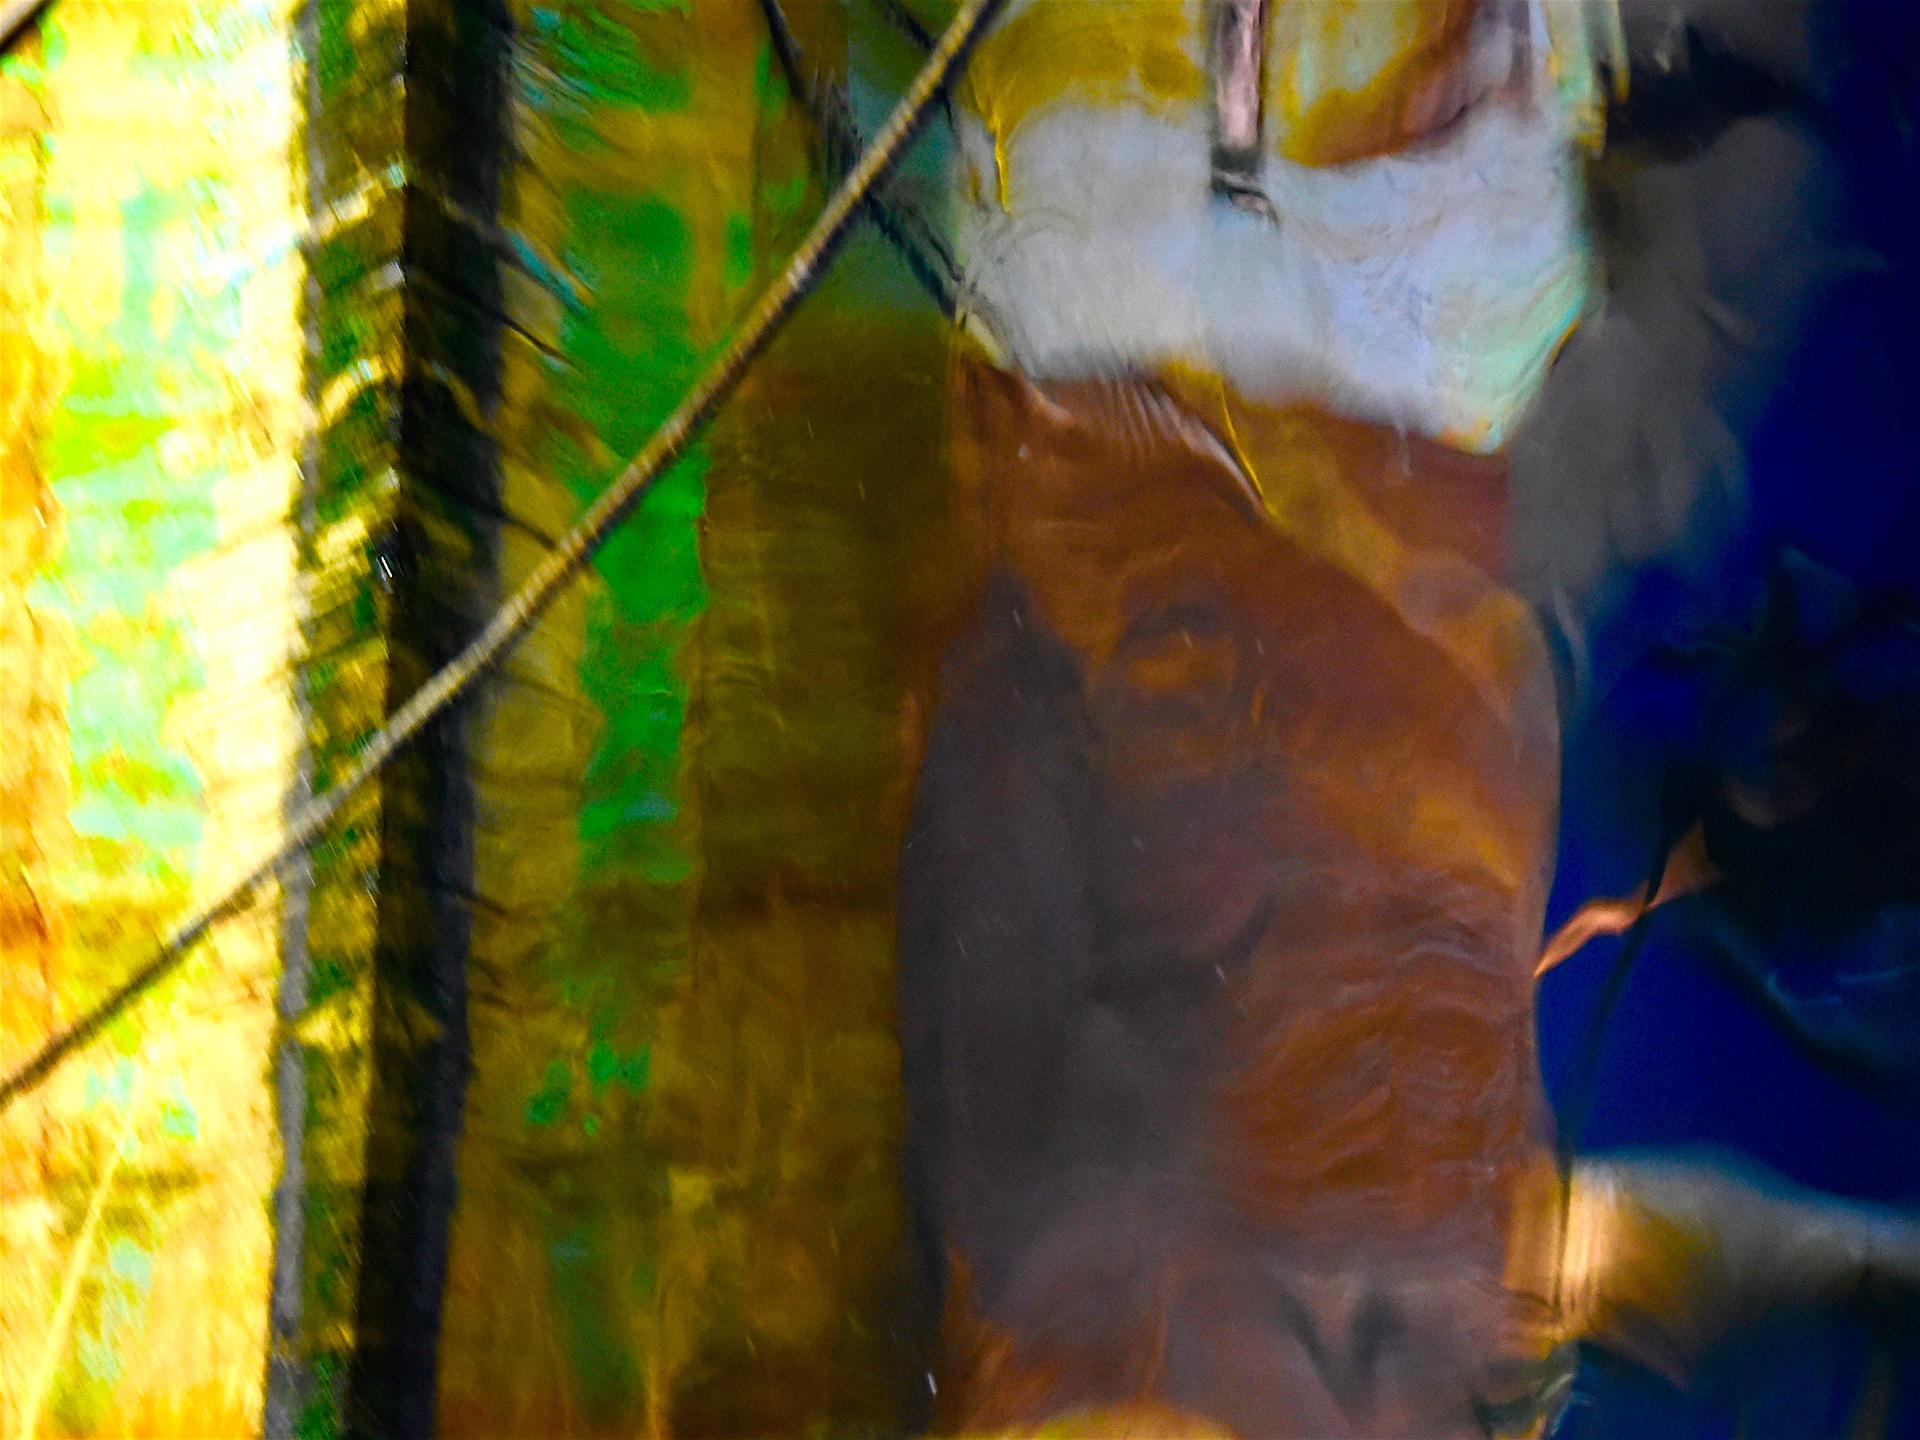 Montauk Reflections #18 by Kat O'Neill